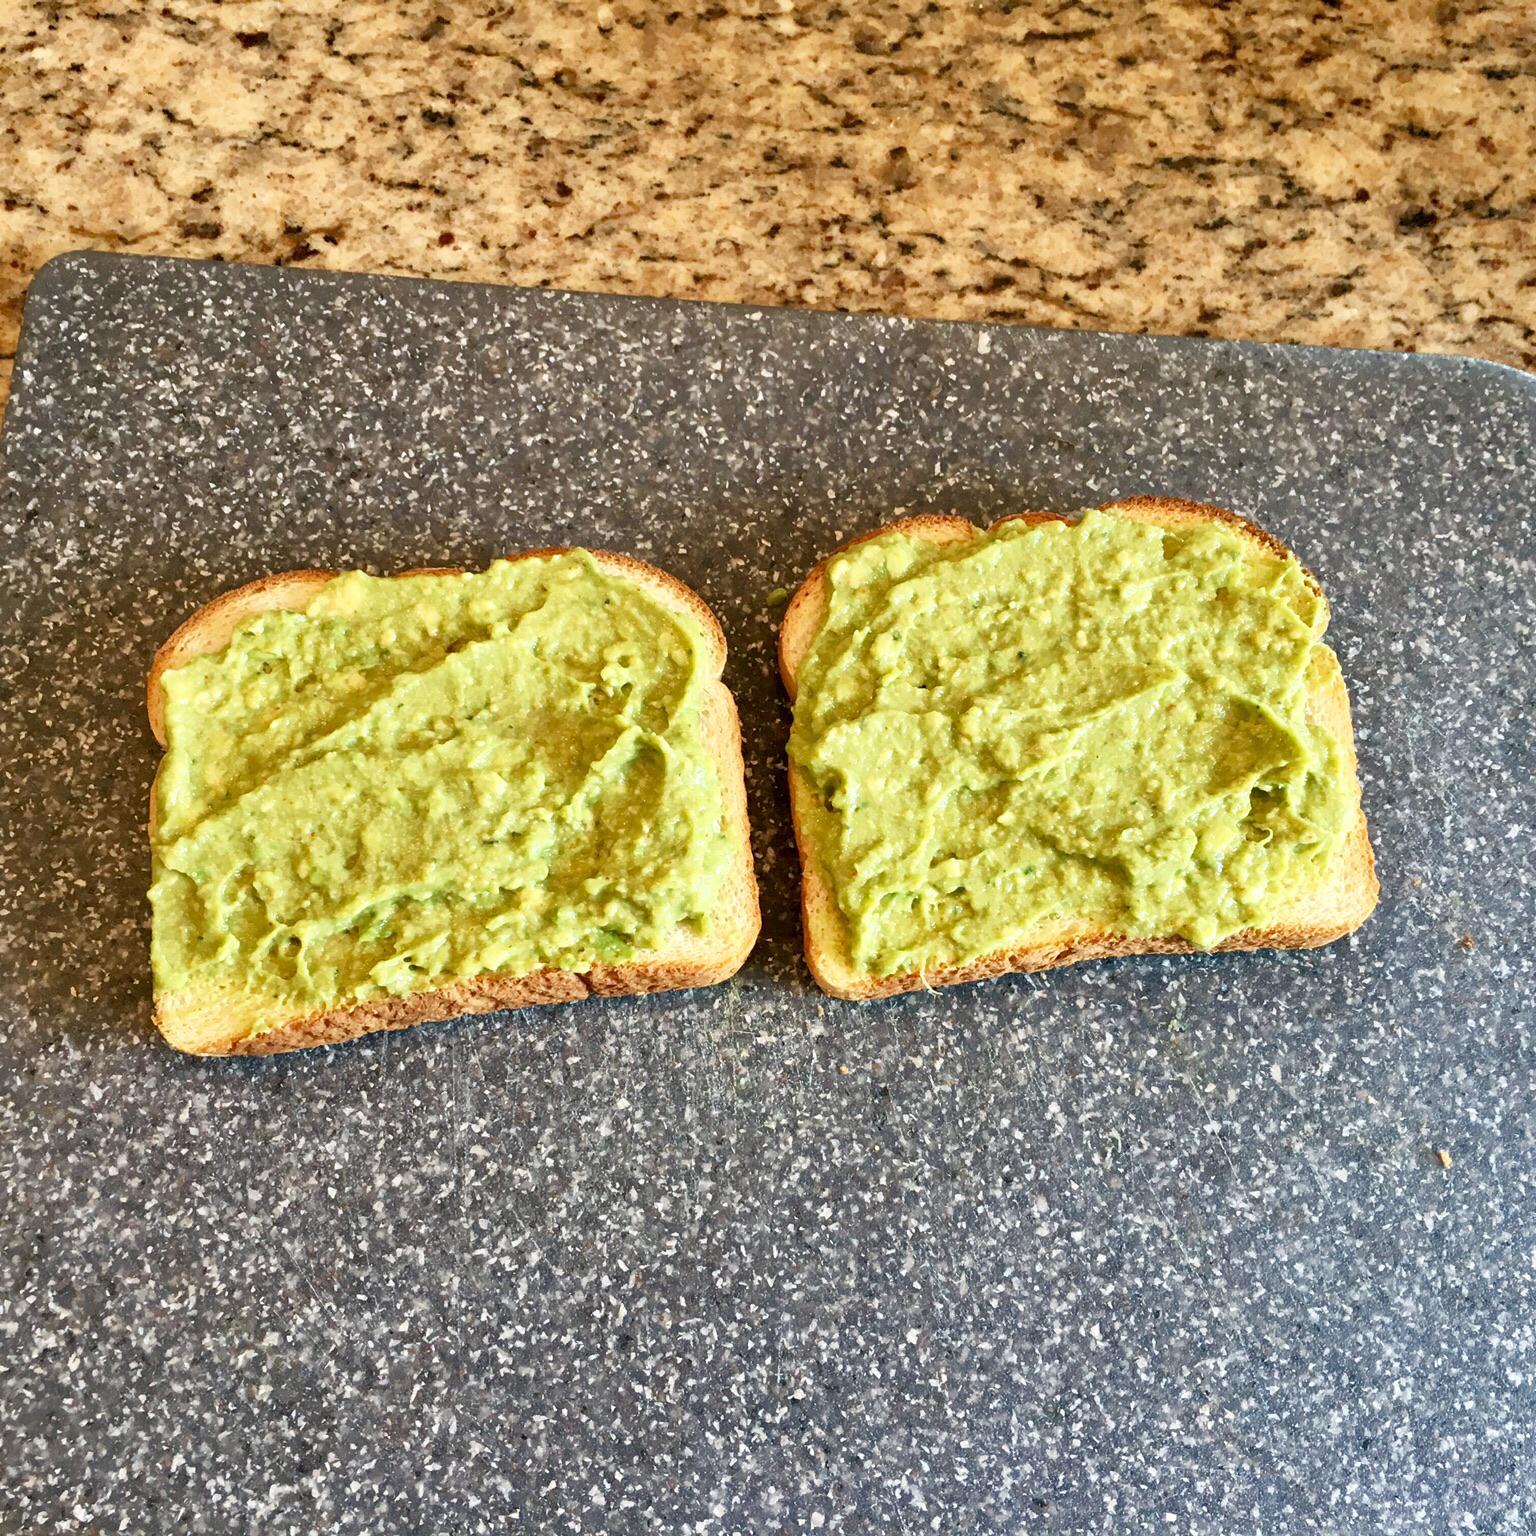 Meyer Lemon Avocado Toast